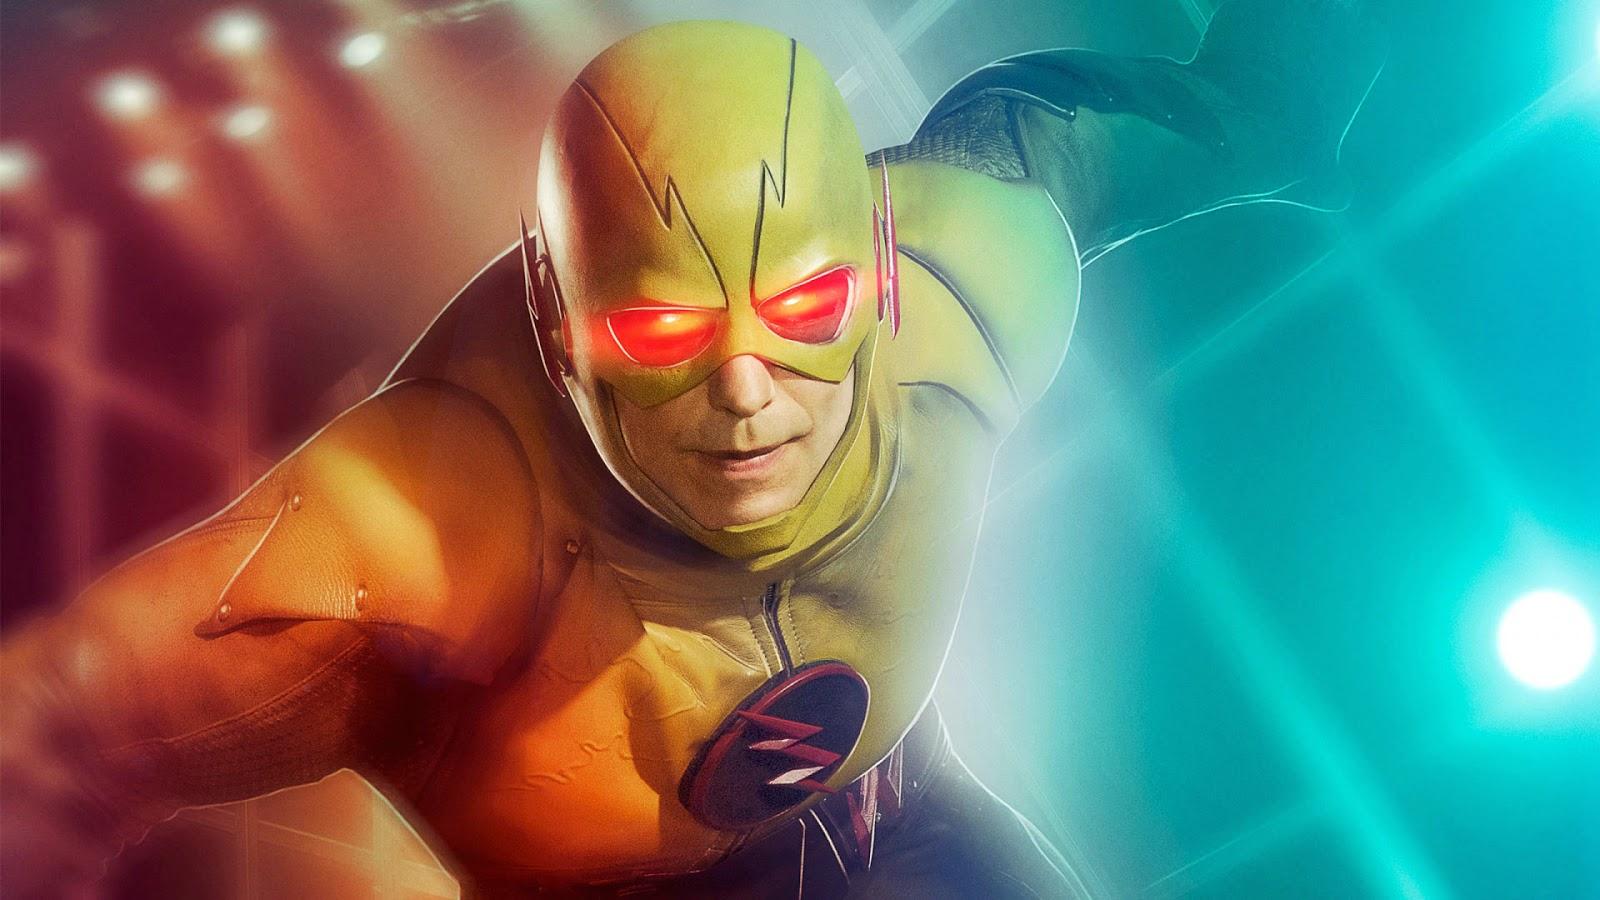 Papel de Parede Filme The Flash movie wallpaper image hd free